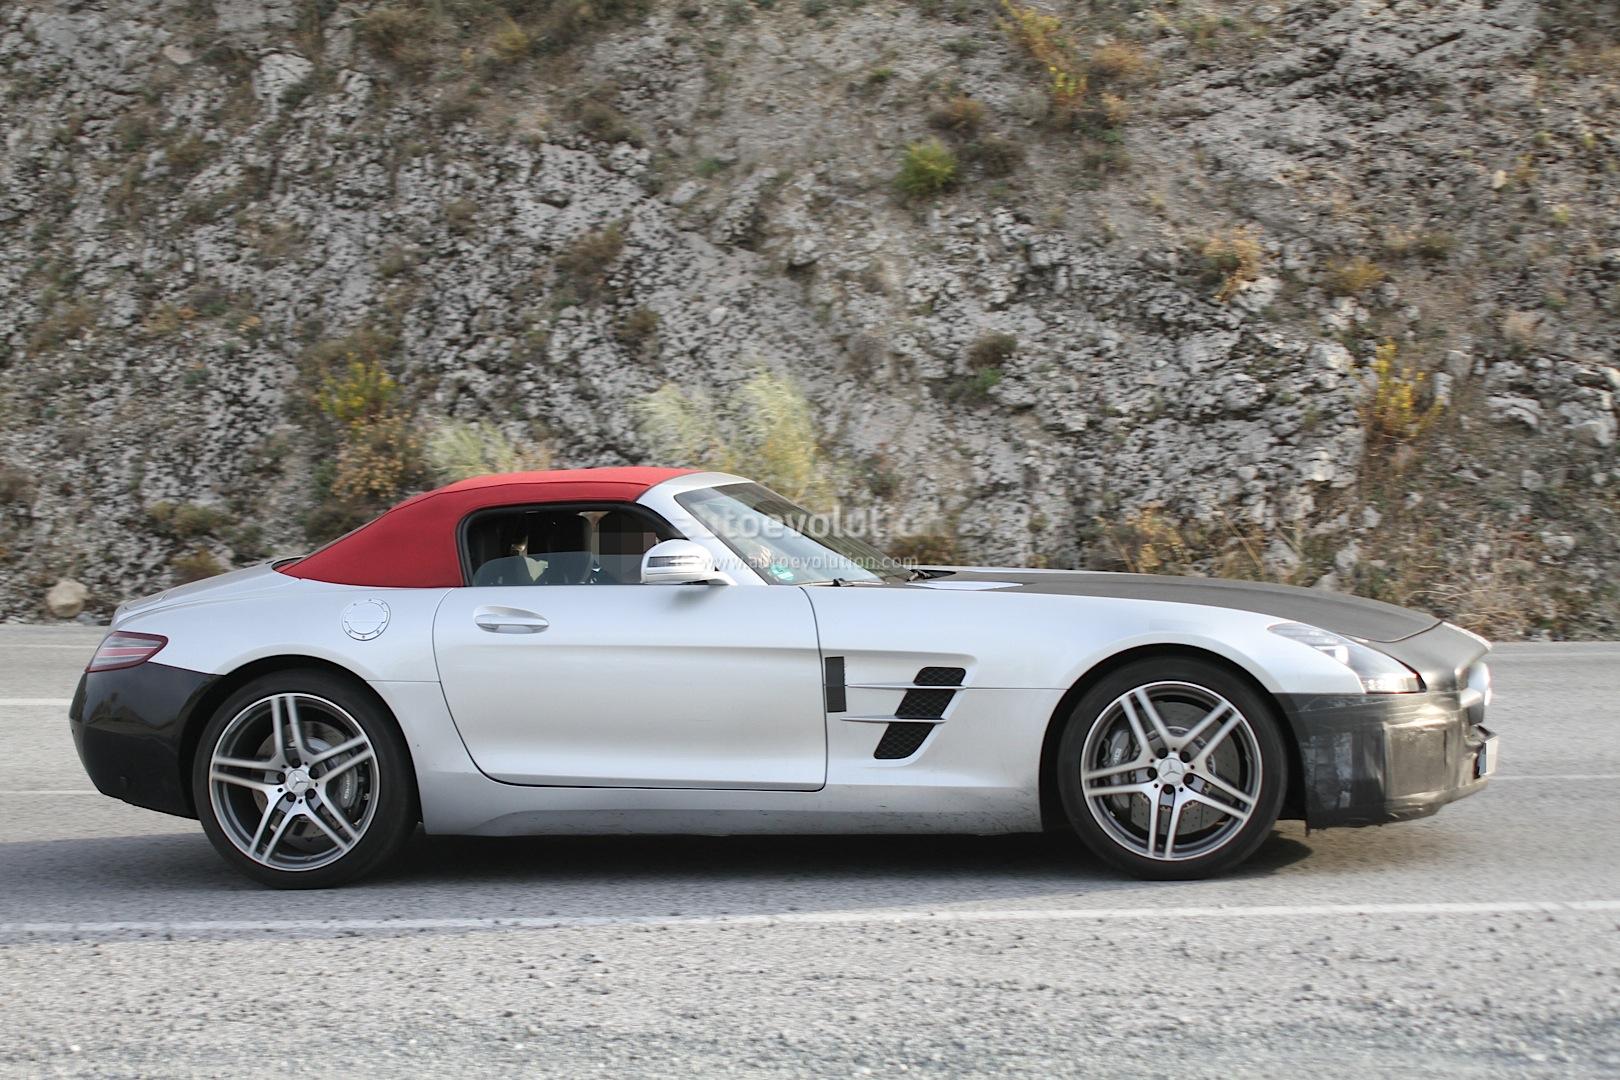 Spyshots 2015 mercedes sls amg facelift autoevolution for 2015 mercedes benz sls amg convertible